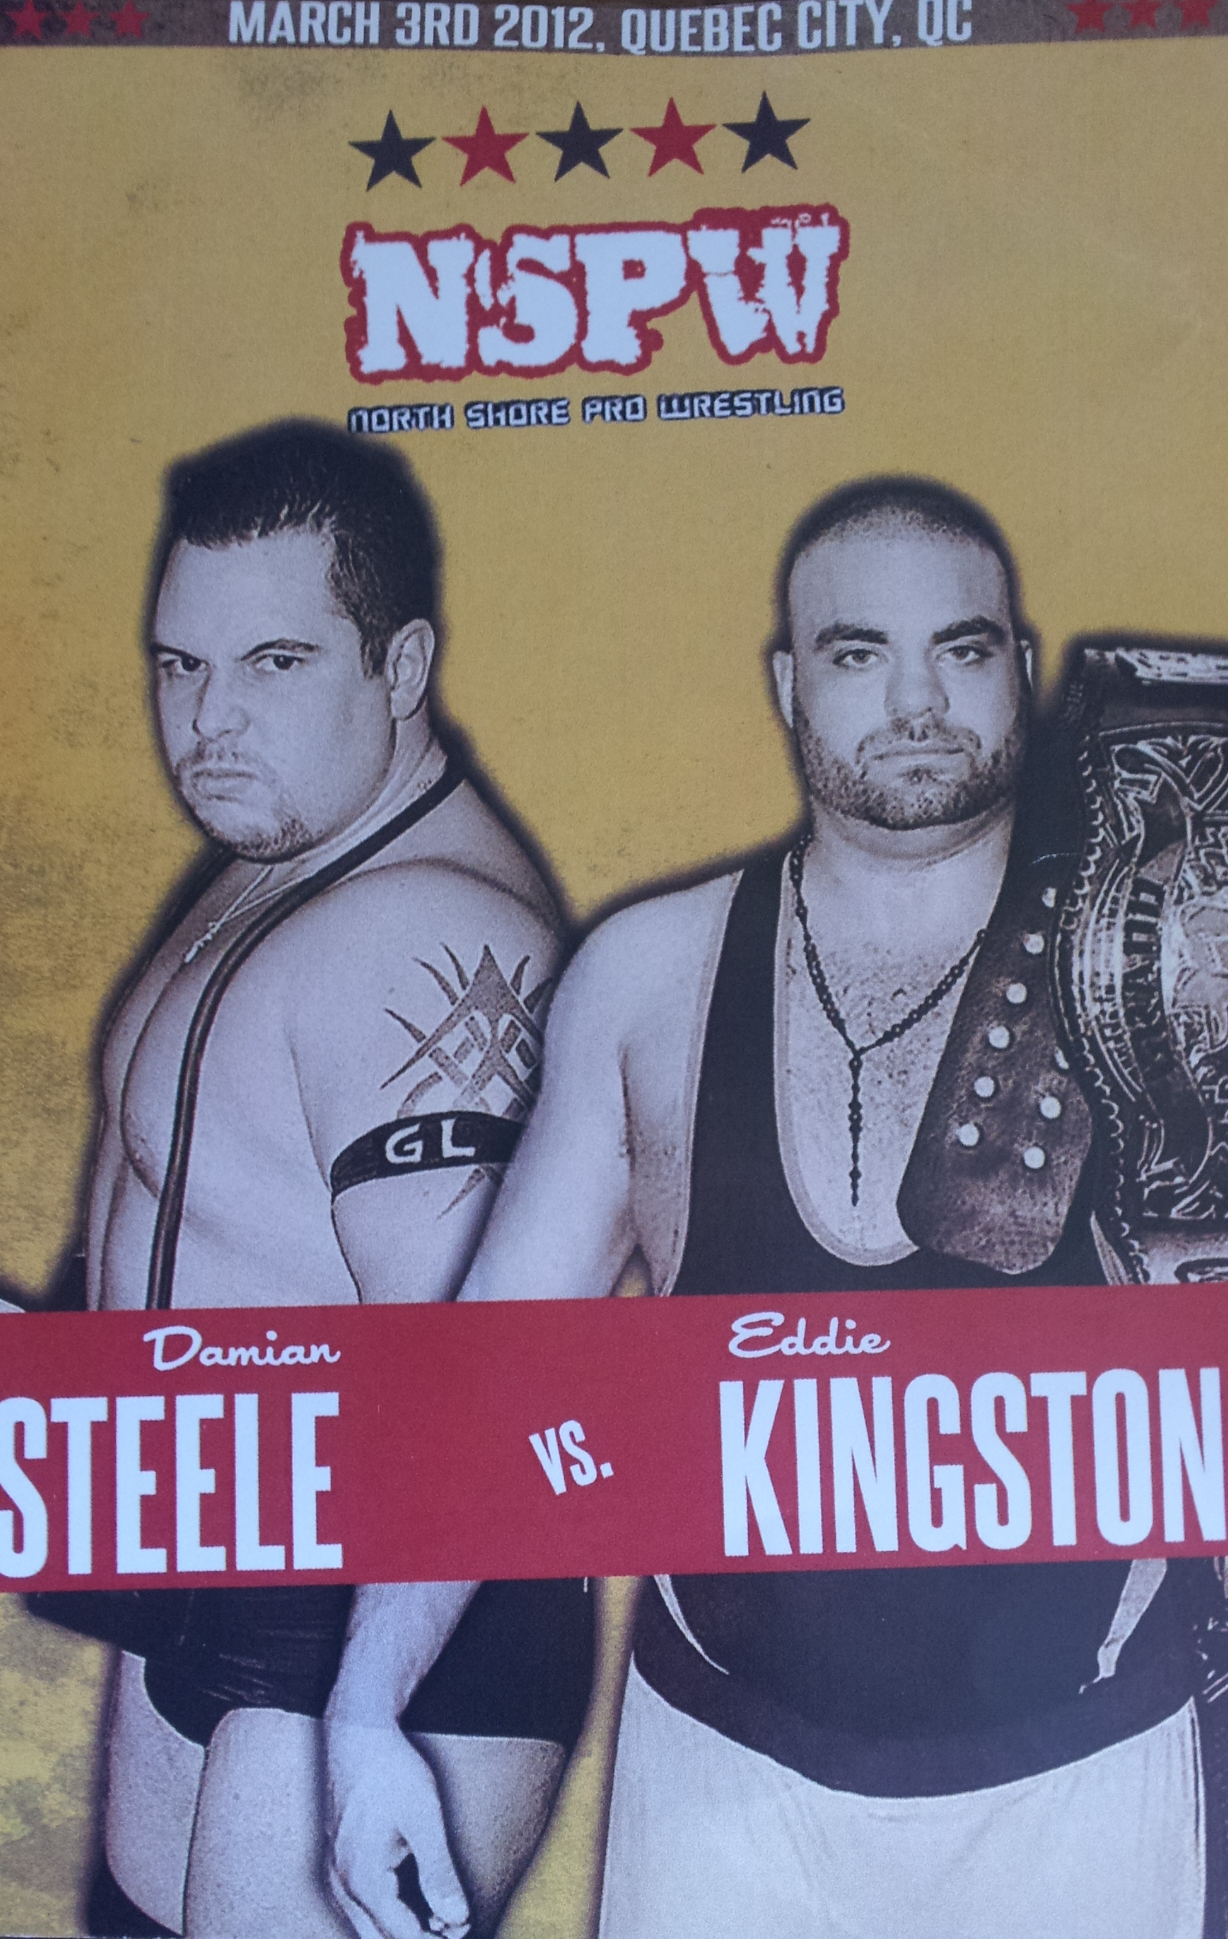 NSPW 2012.03.03 Steele vs. Kingston 리뷰